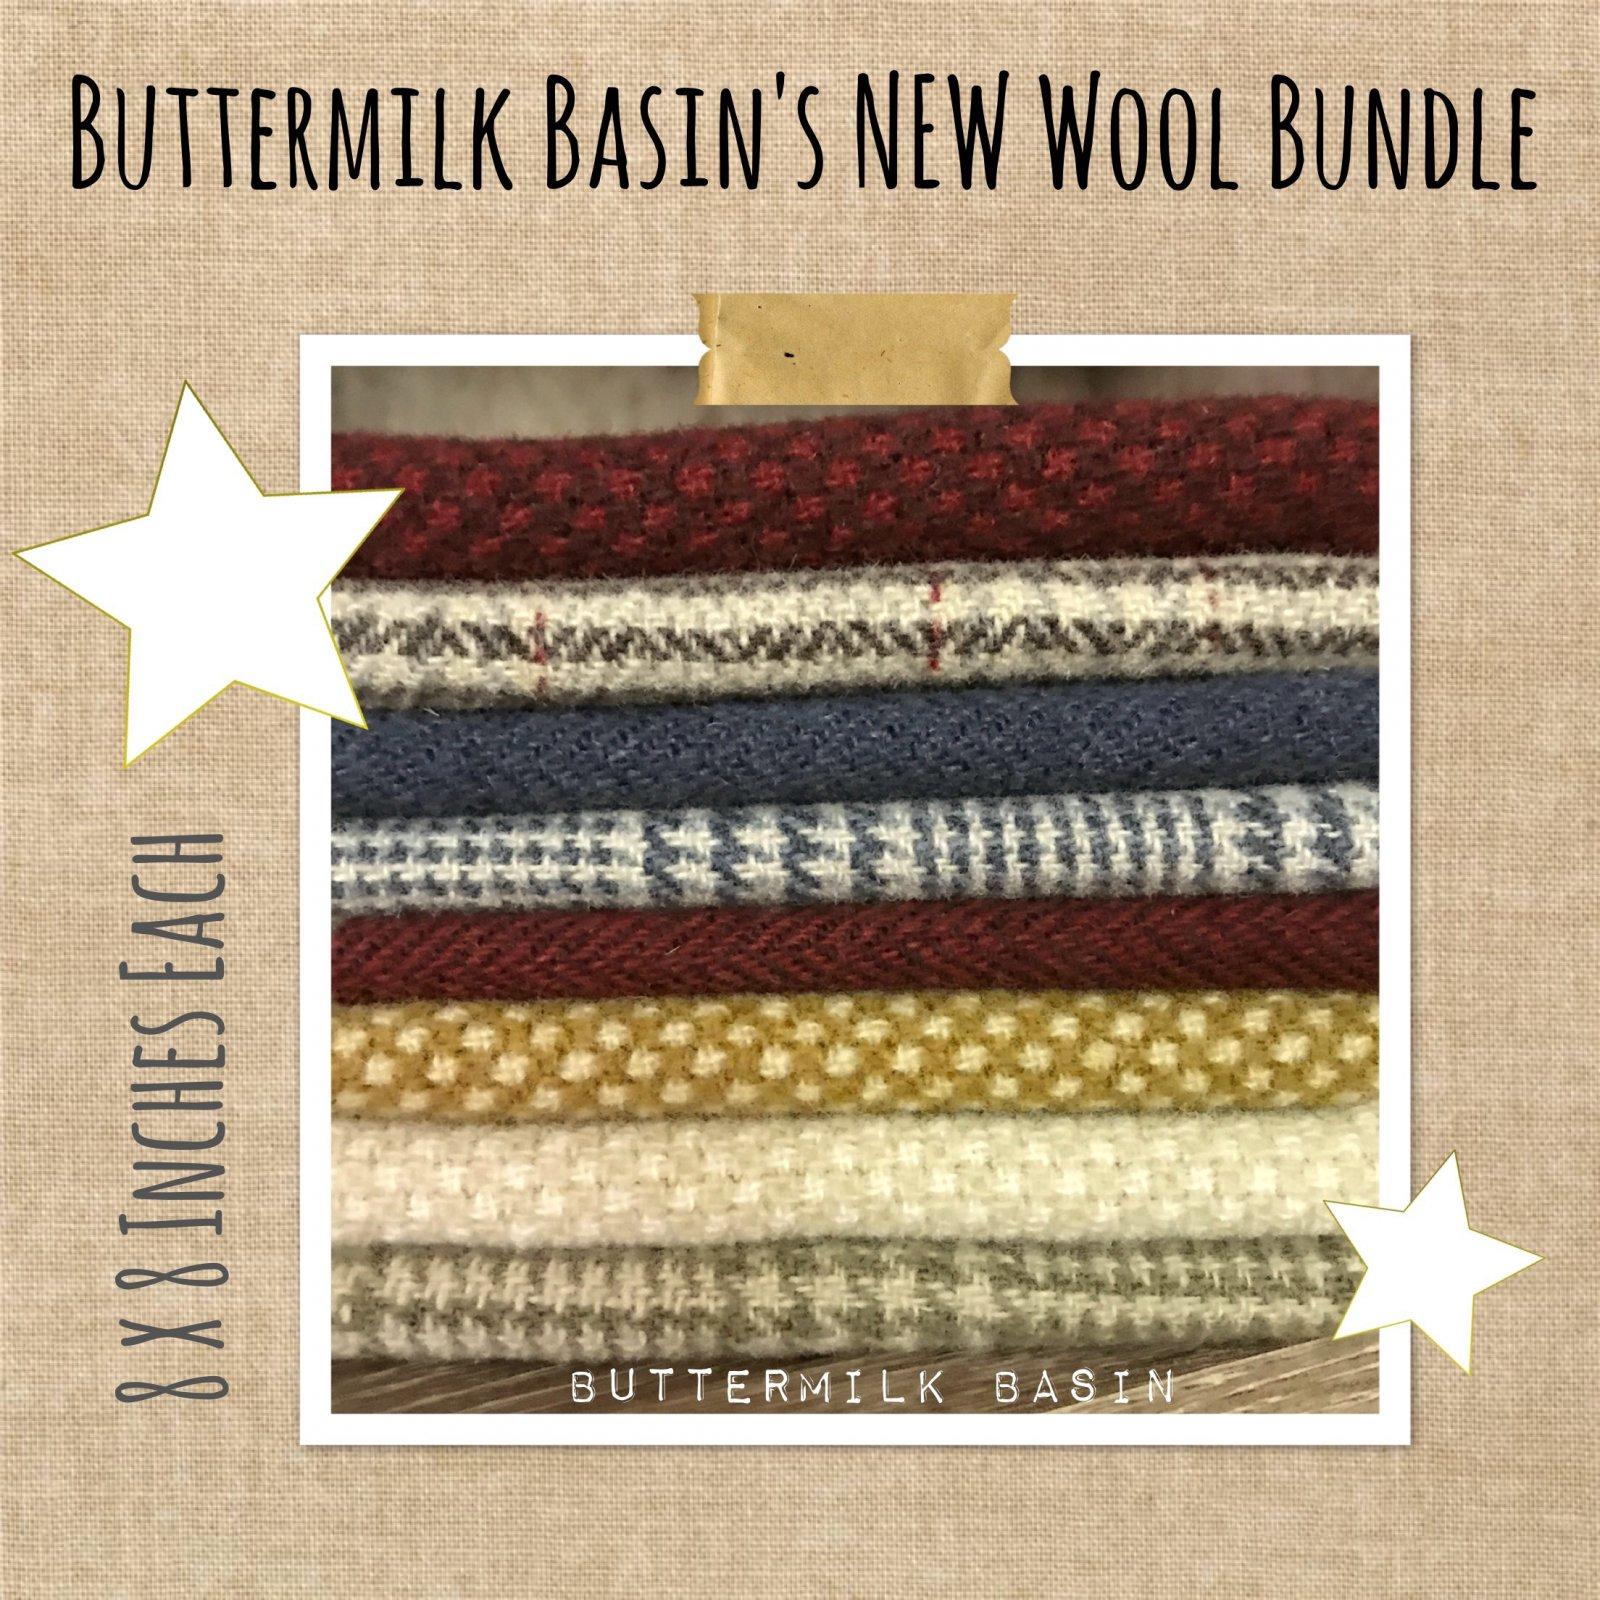 Buttermilk Basin's Spirit of America Wool Bundle